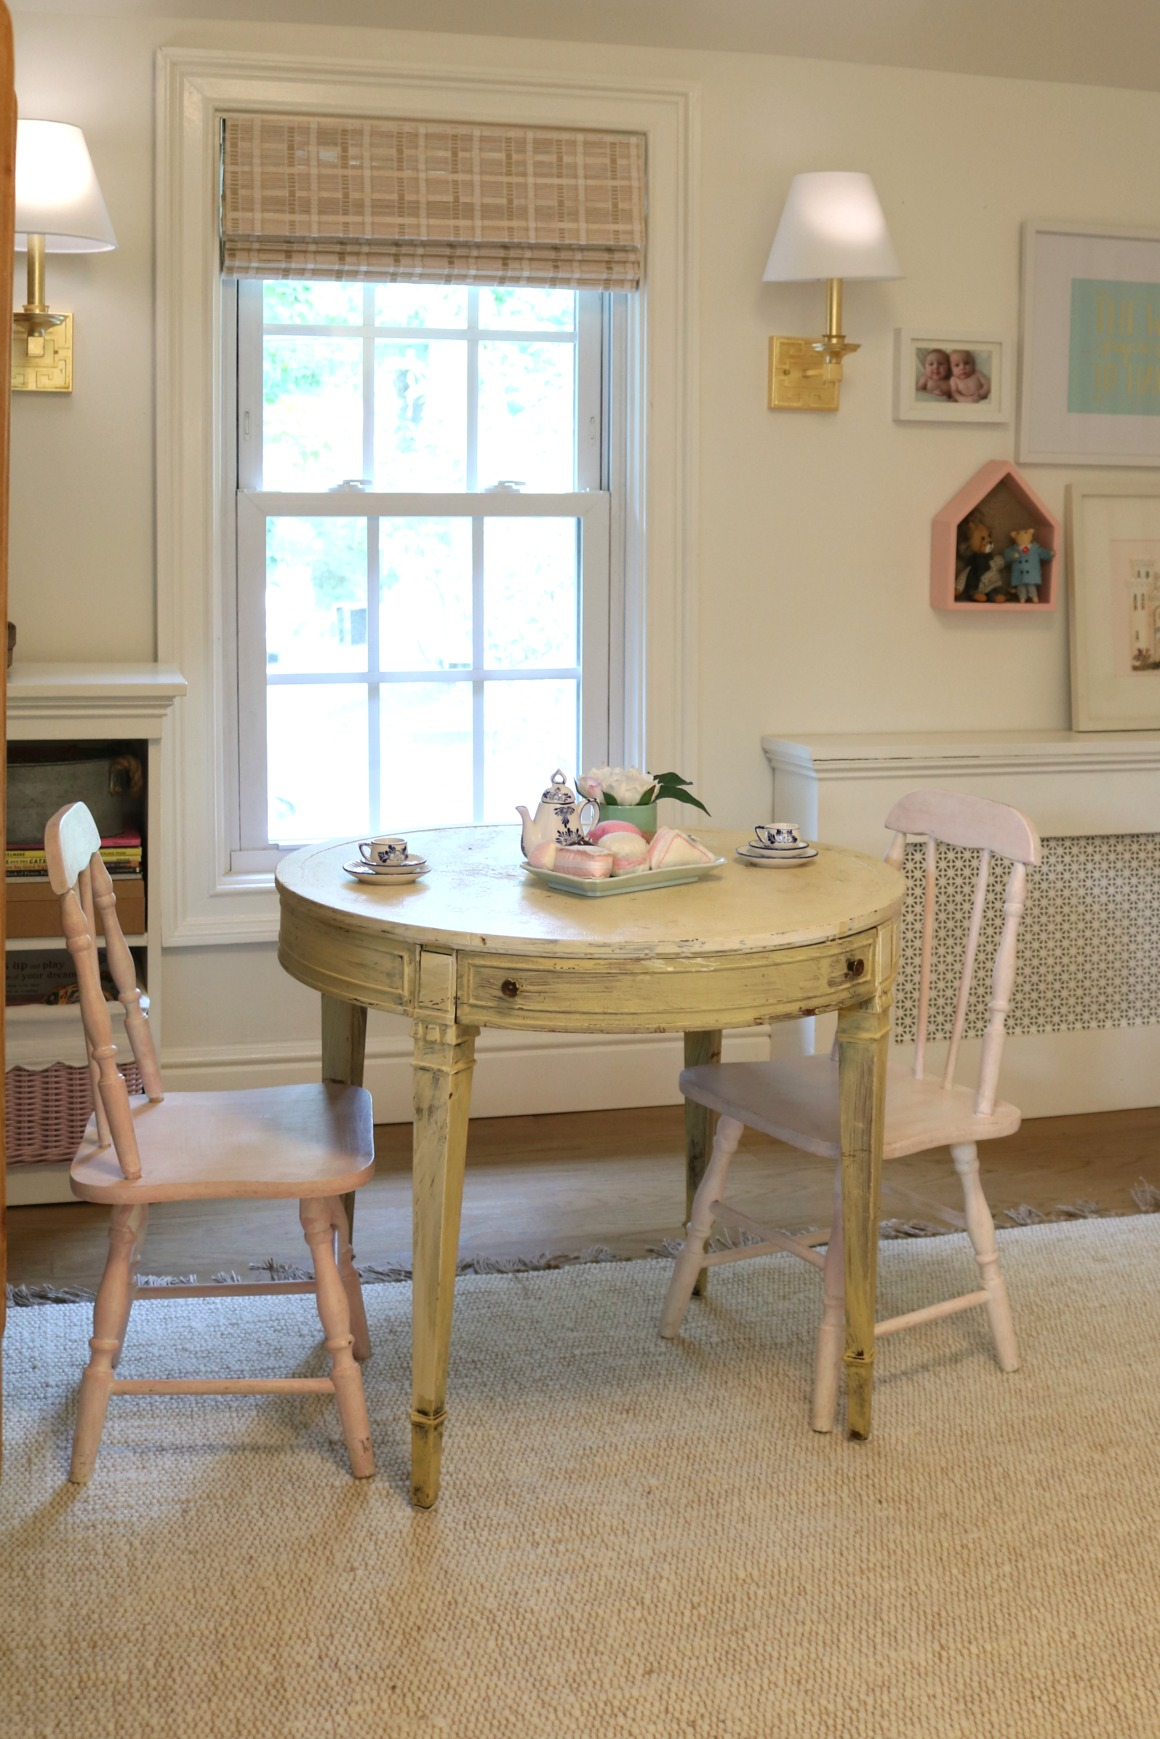 Affordable Bamboo Woven Shades And Fabric Roman Shades